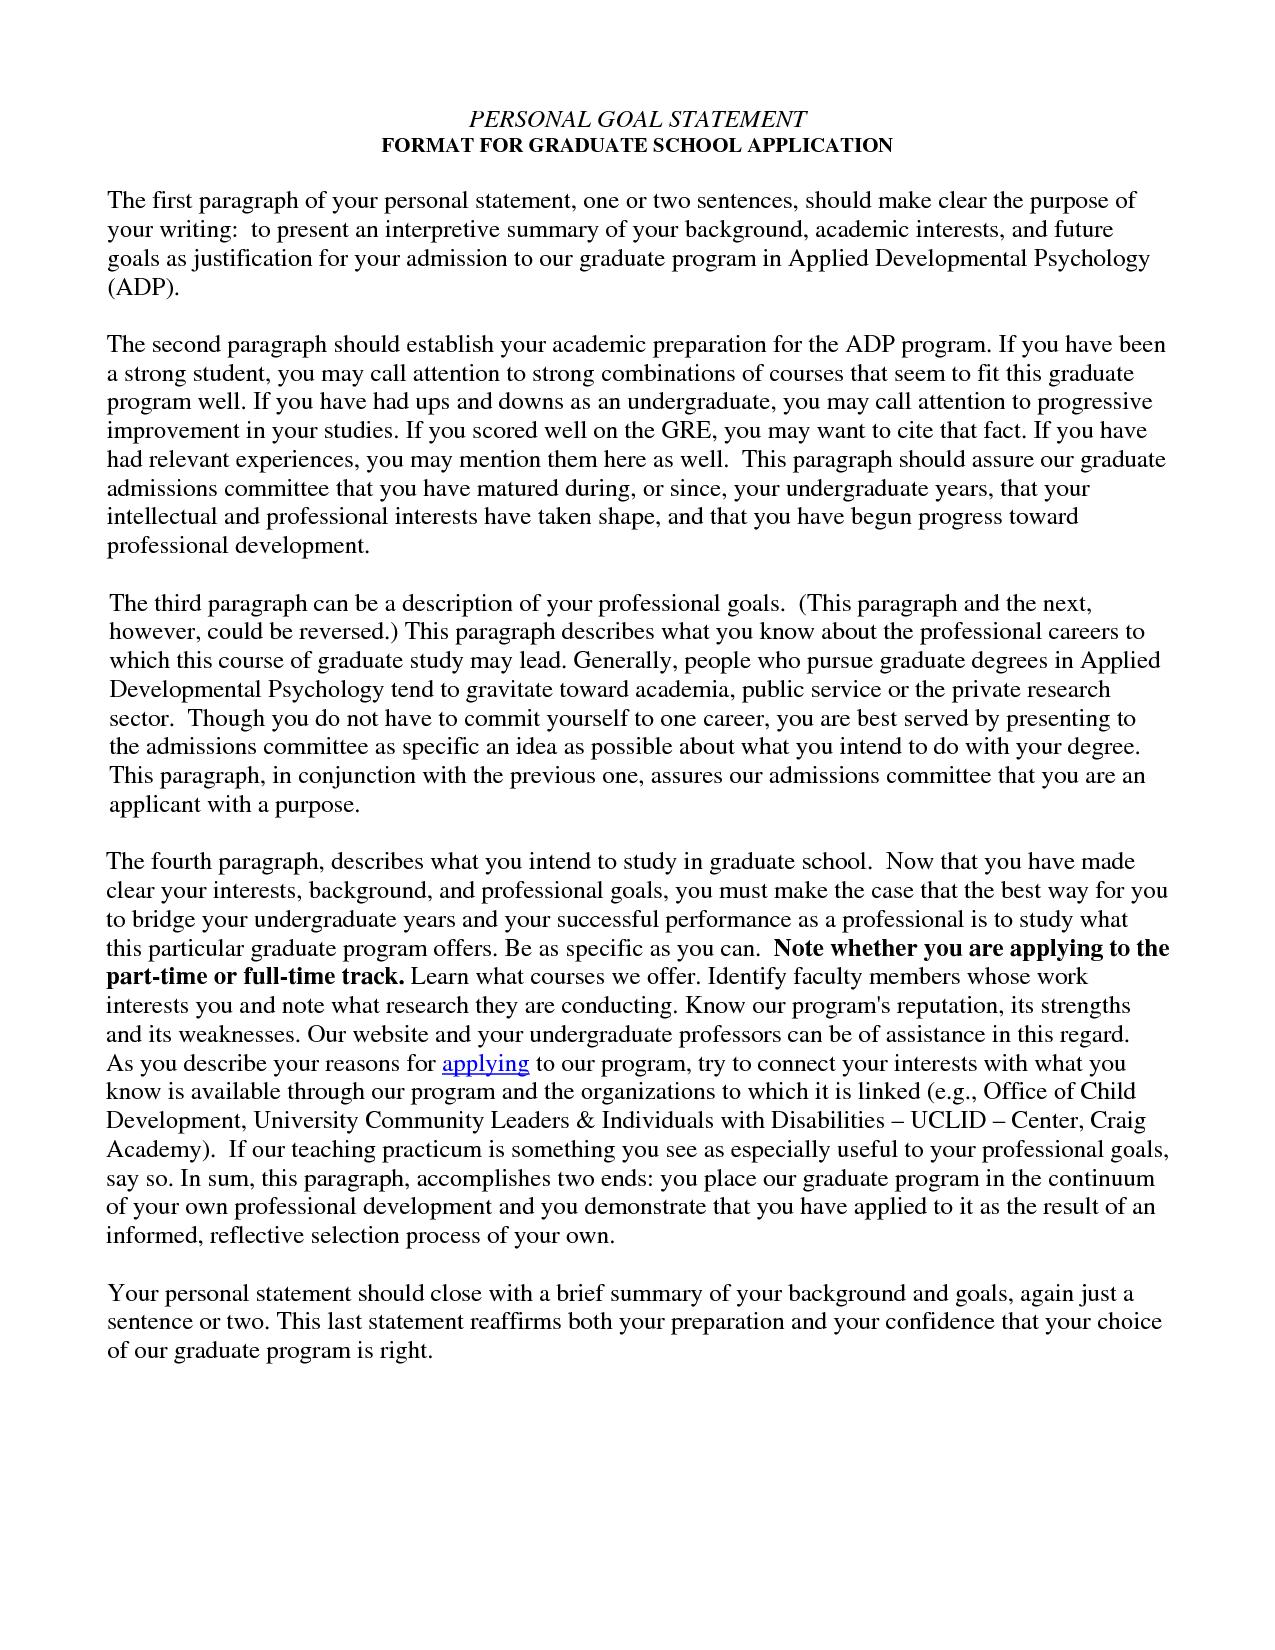 Essays personal statement job application